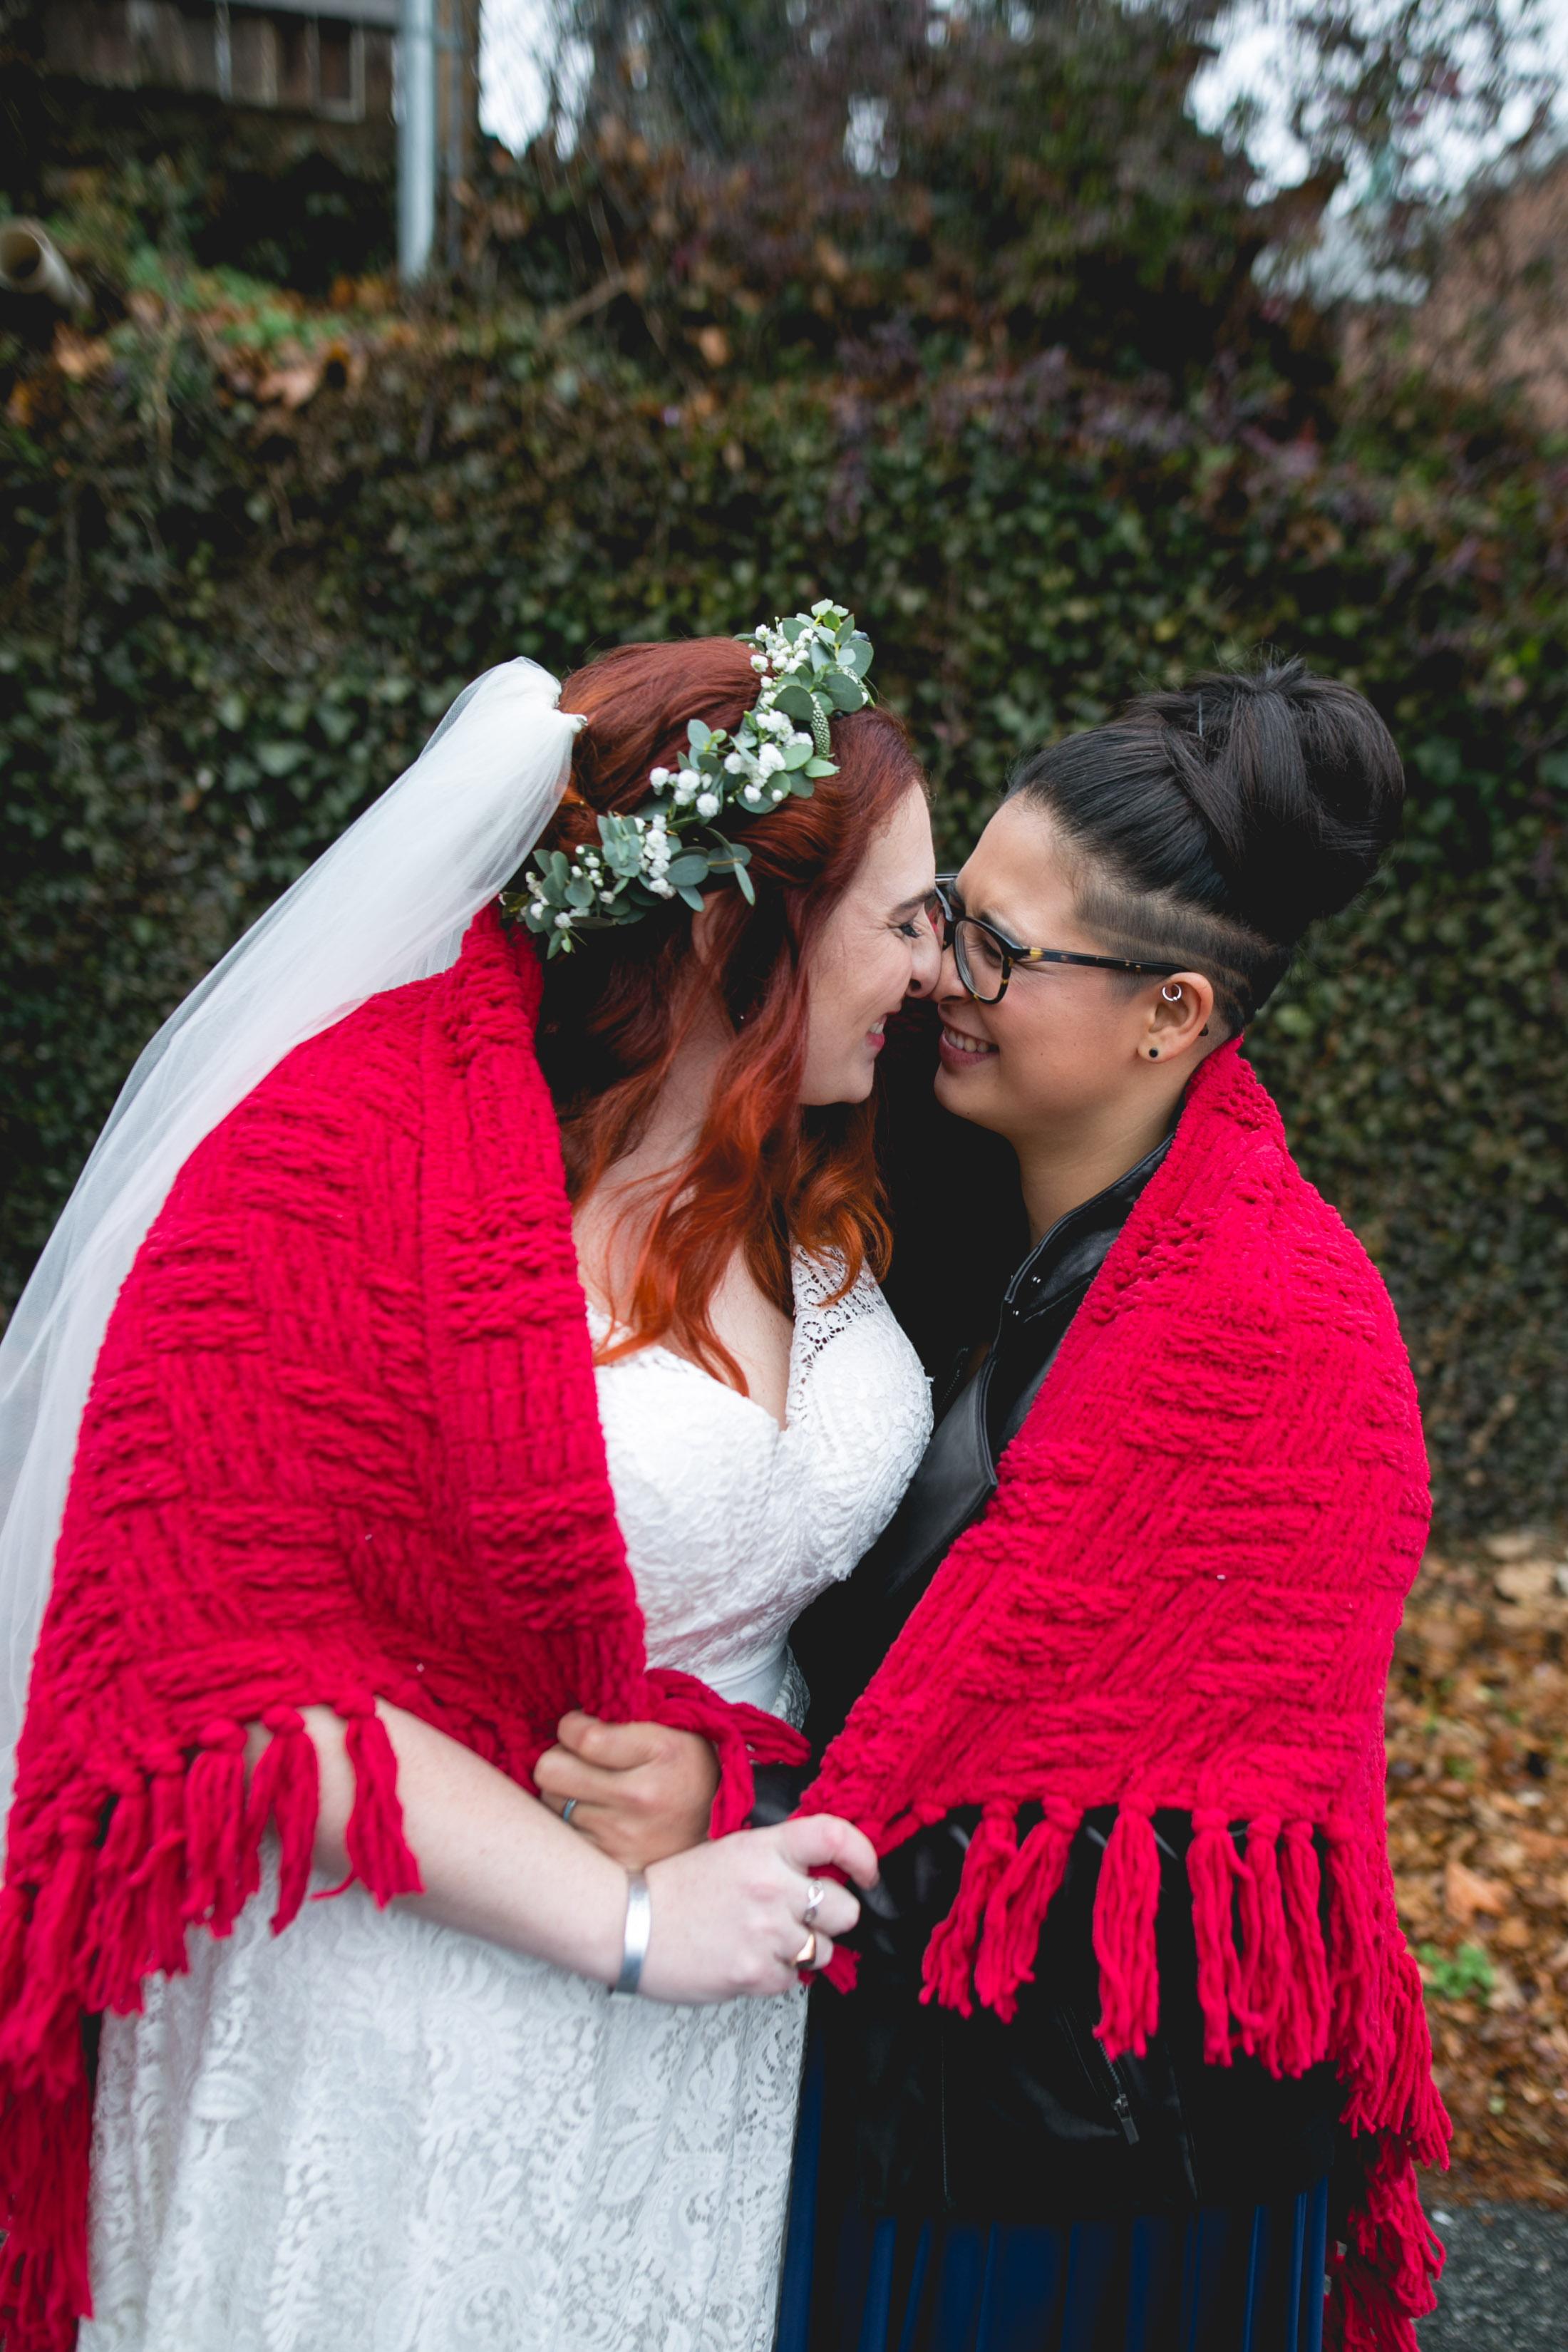 LGBTQ Philadelphia Wedding by Swiger Photography the Lesbian photographer 18